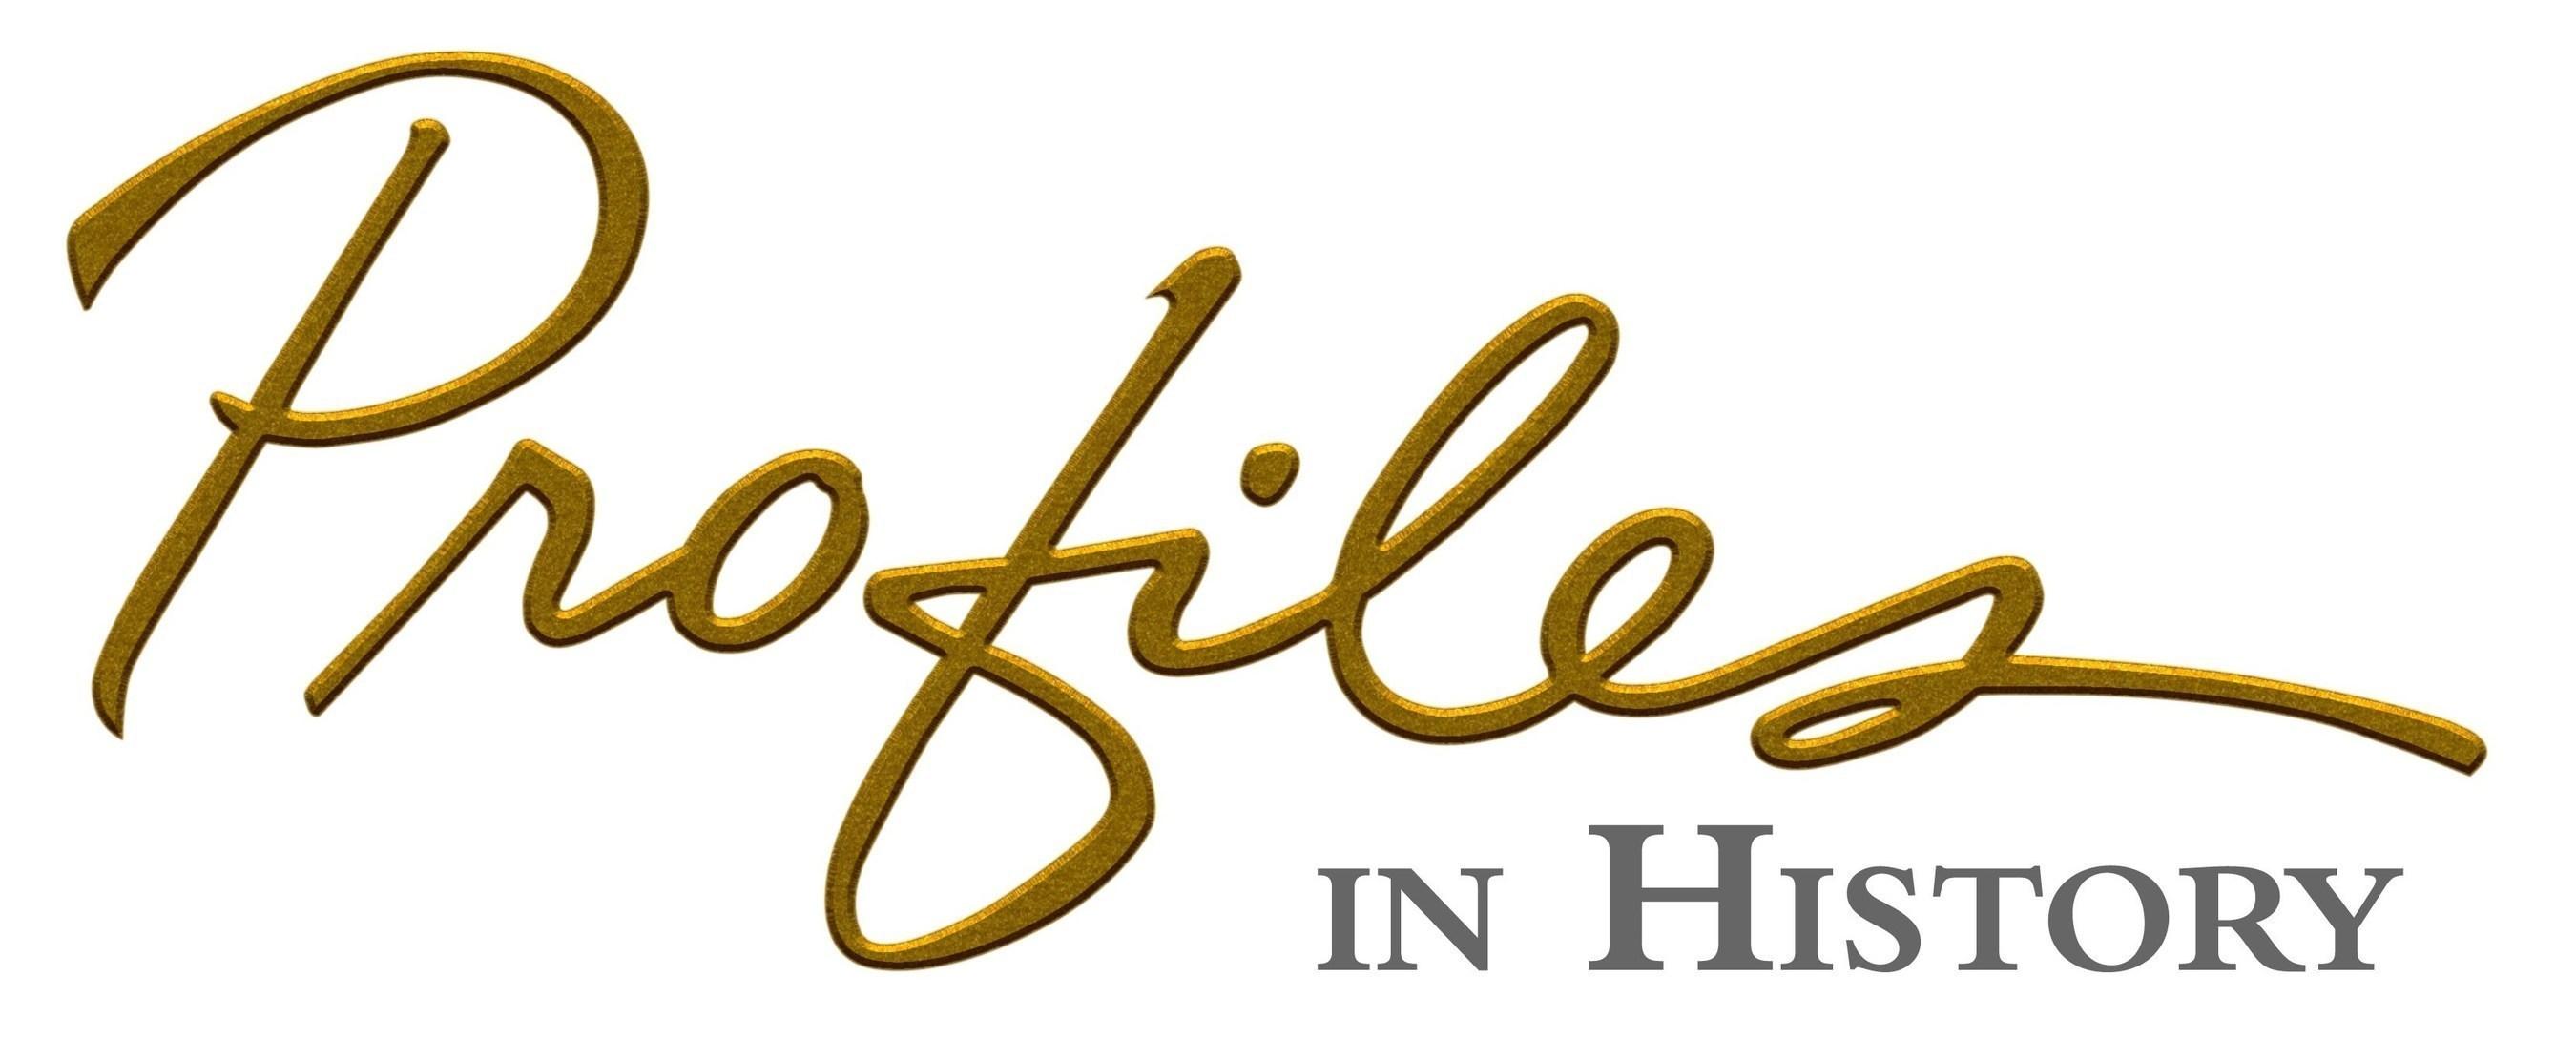 Profiles In History Logo